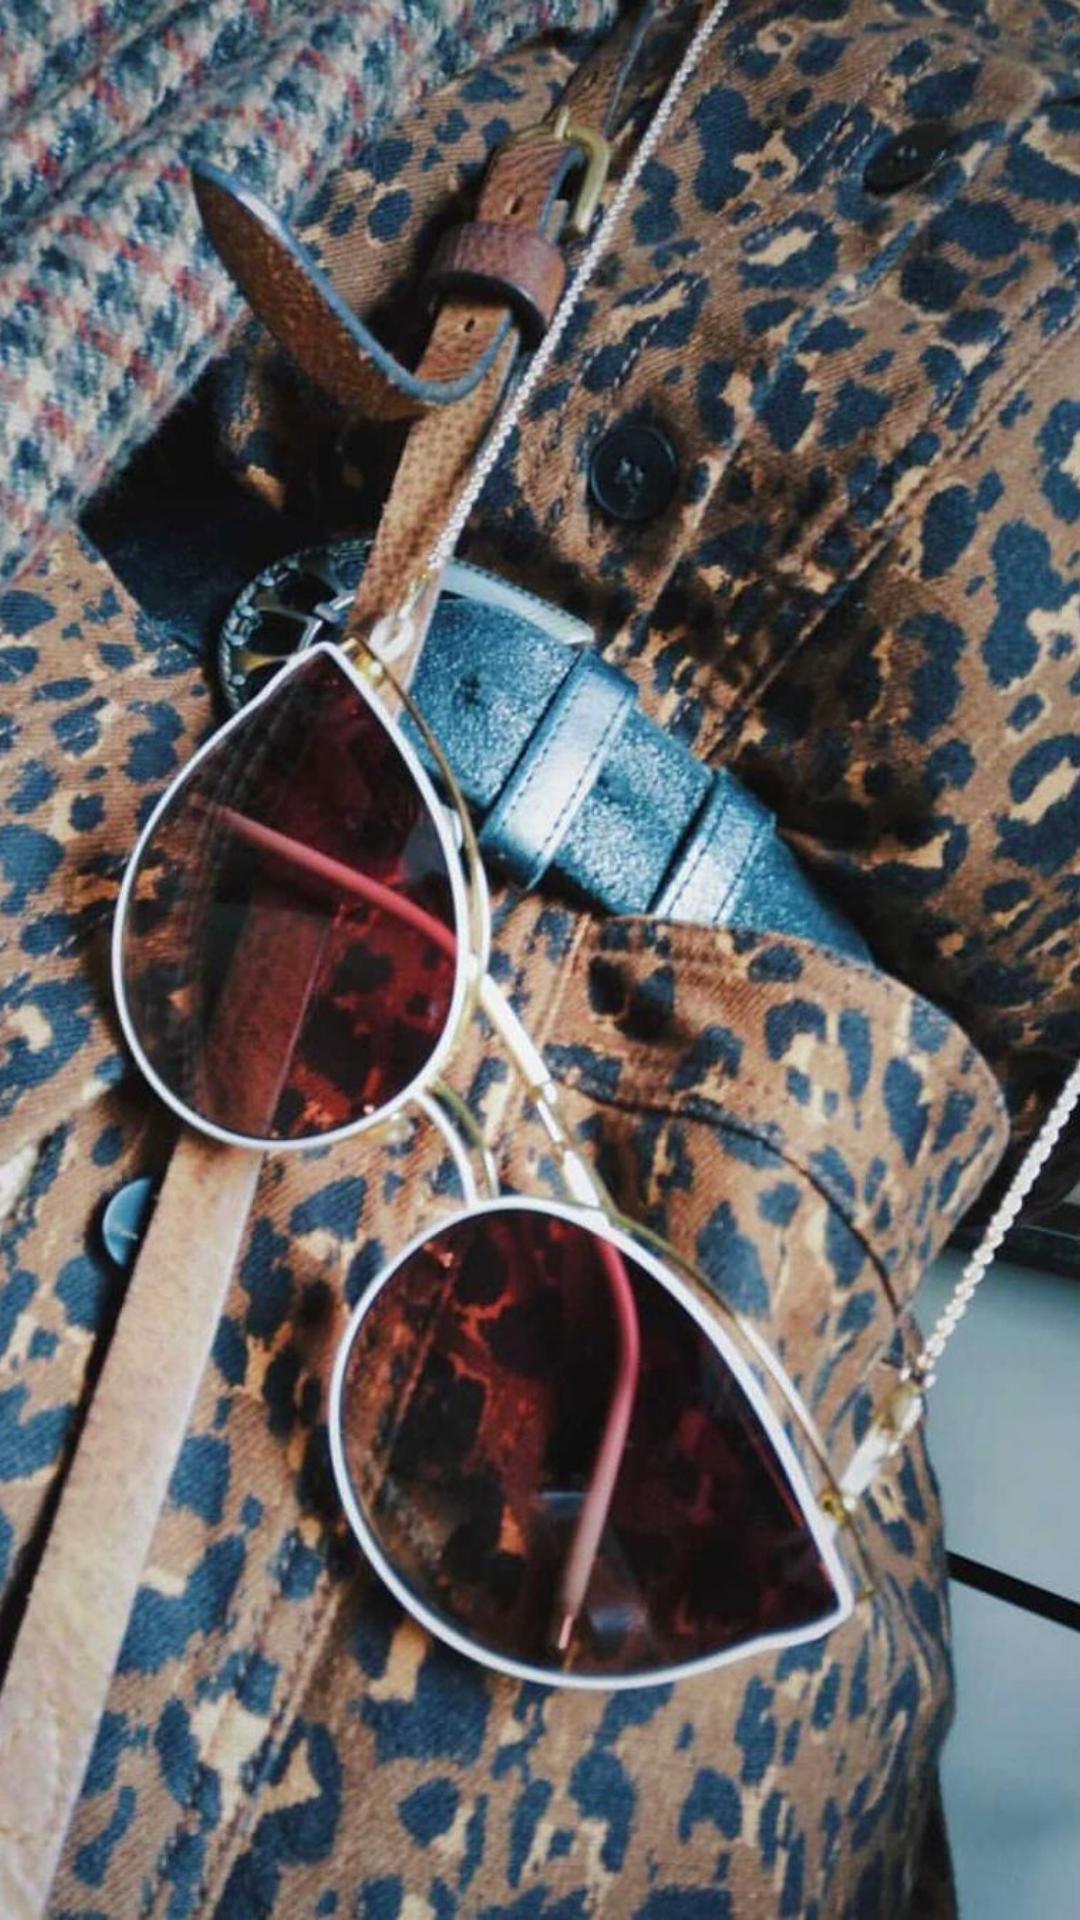 Bast White - Sunglasses, Chain & Leather Case